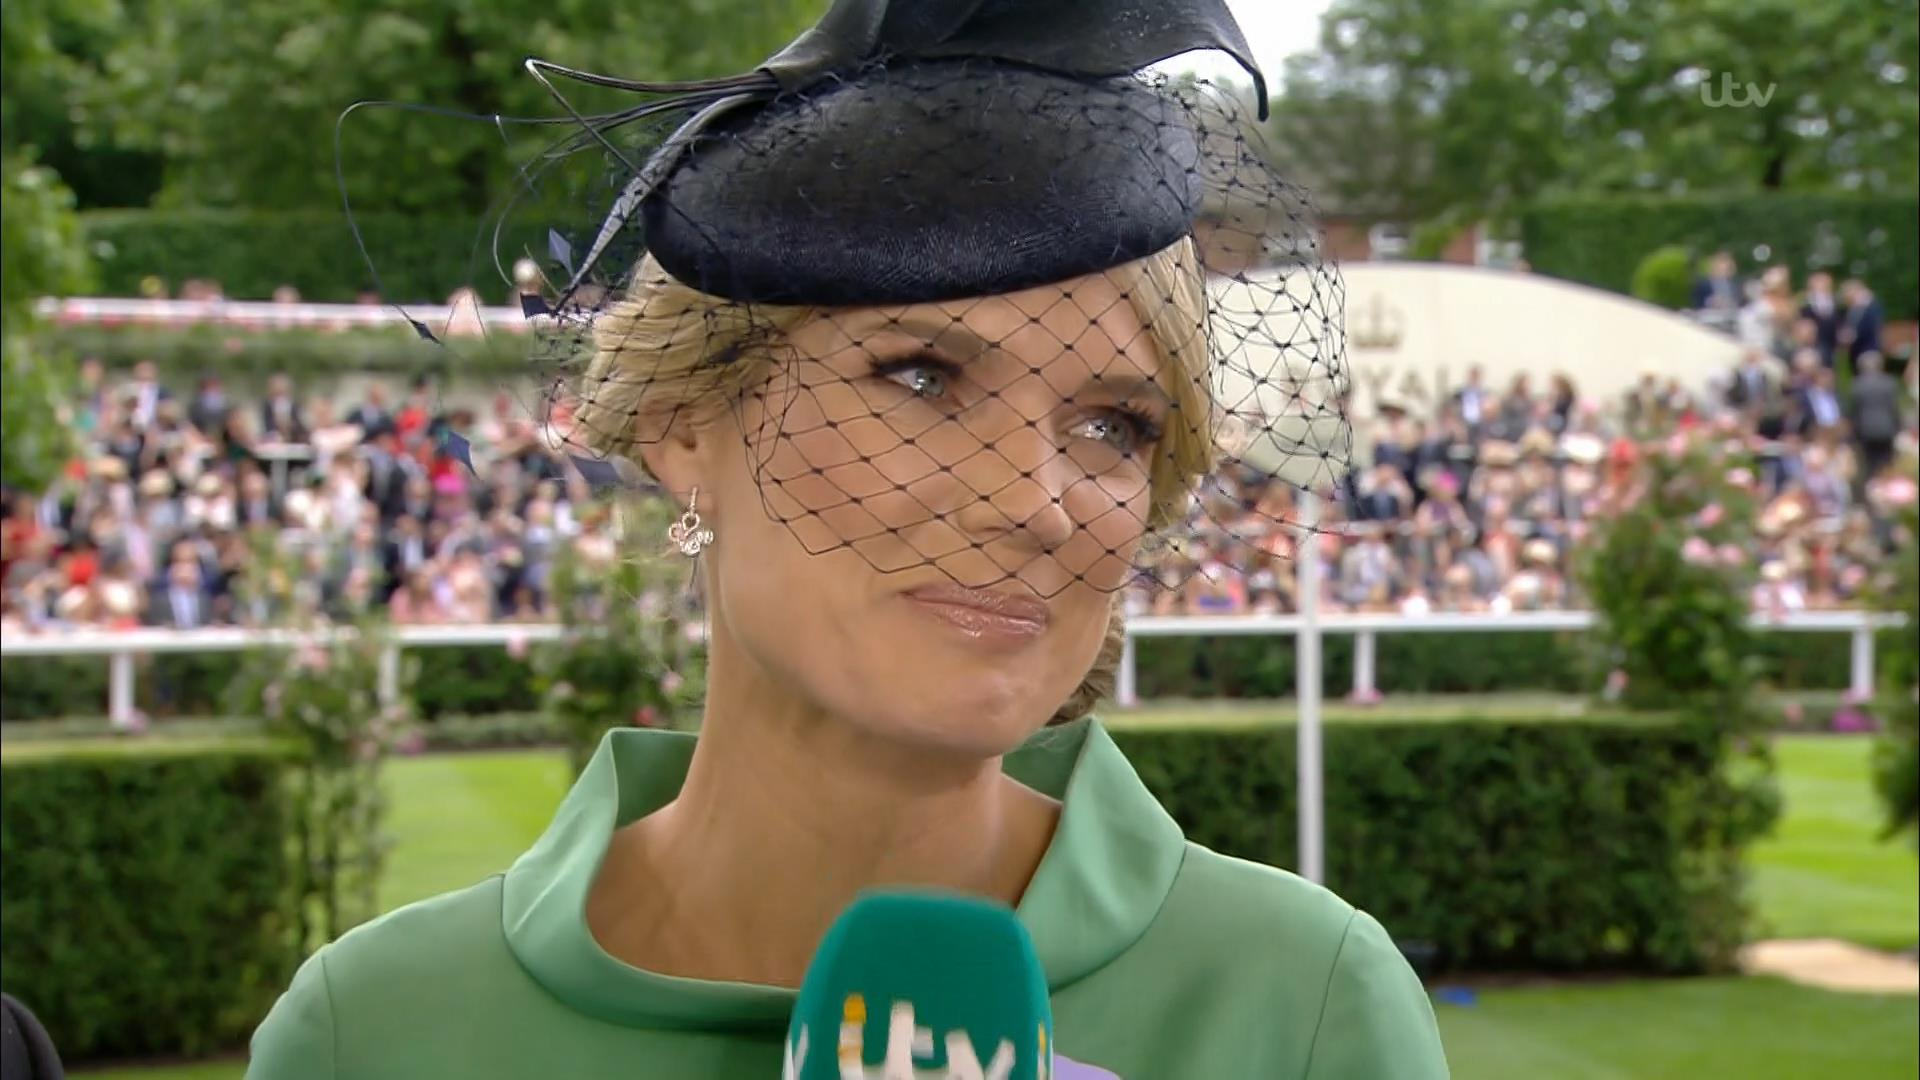 Charlotte Hawkins - ITV Royal Ascot 2018